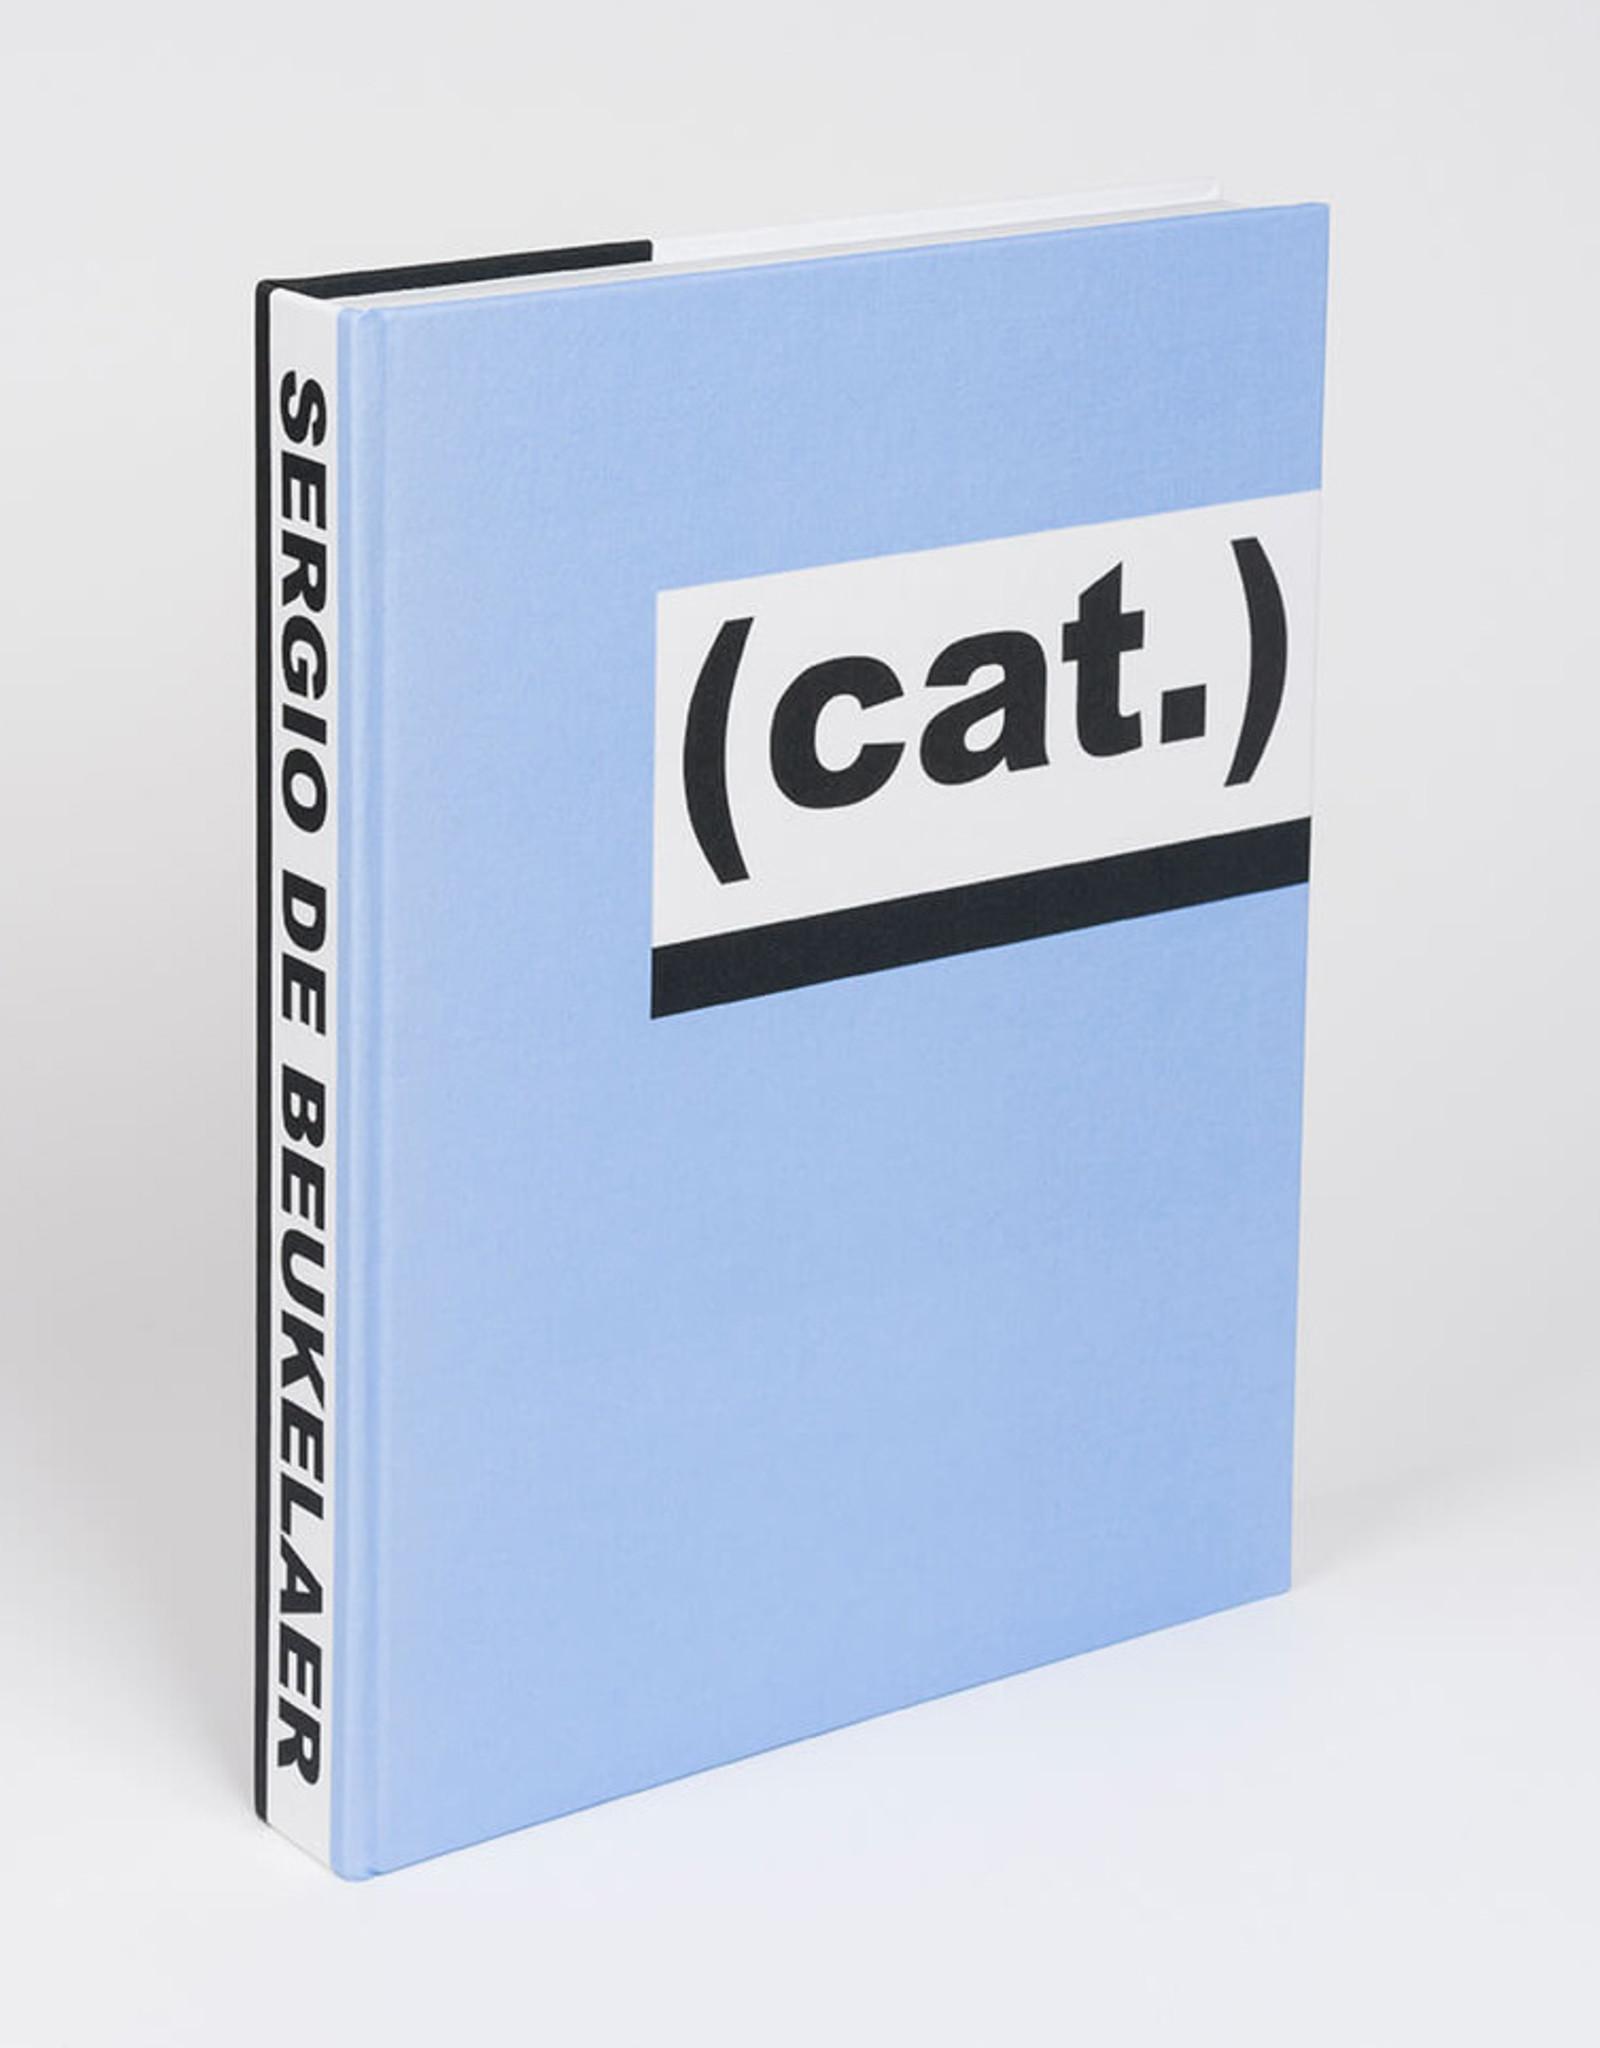 Sergio De Beukelaer - (cat.) with slipcase